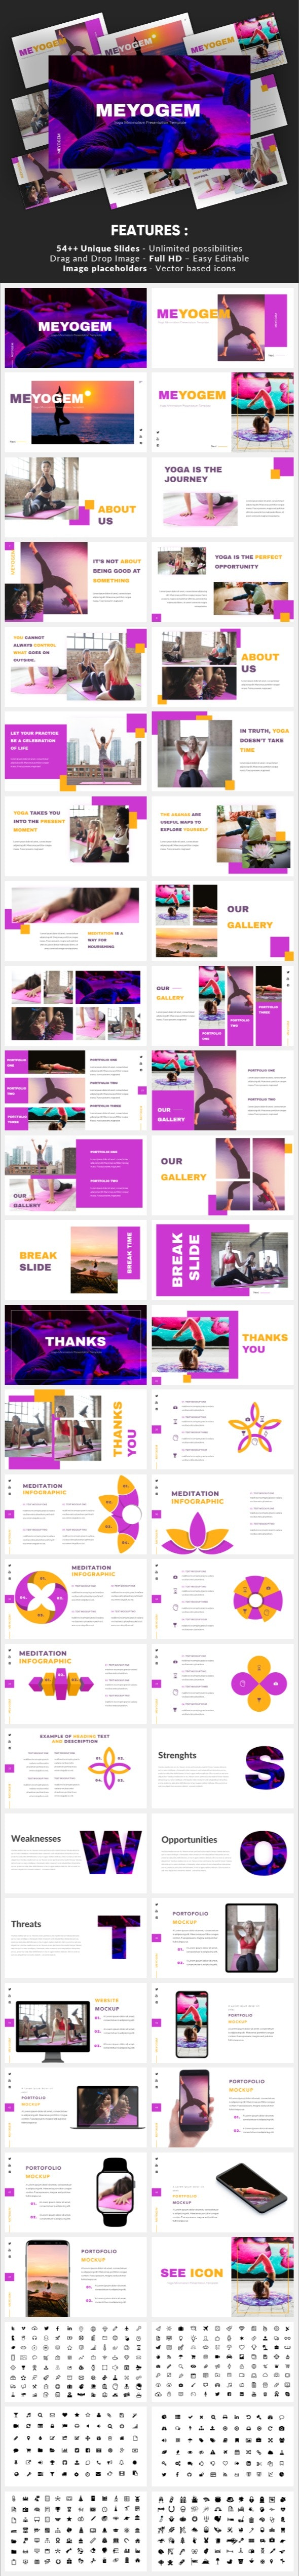 Meyogem - Yoga Minimalism Powerpoint Template - Business PowerPoint Templates